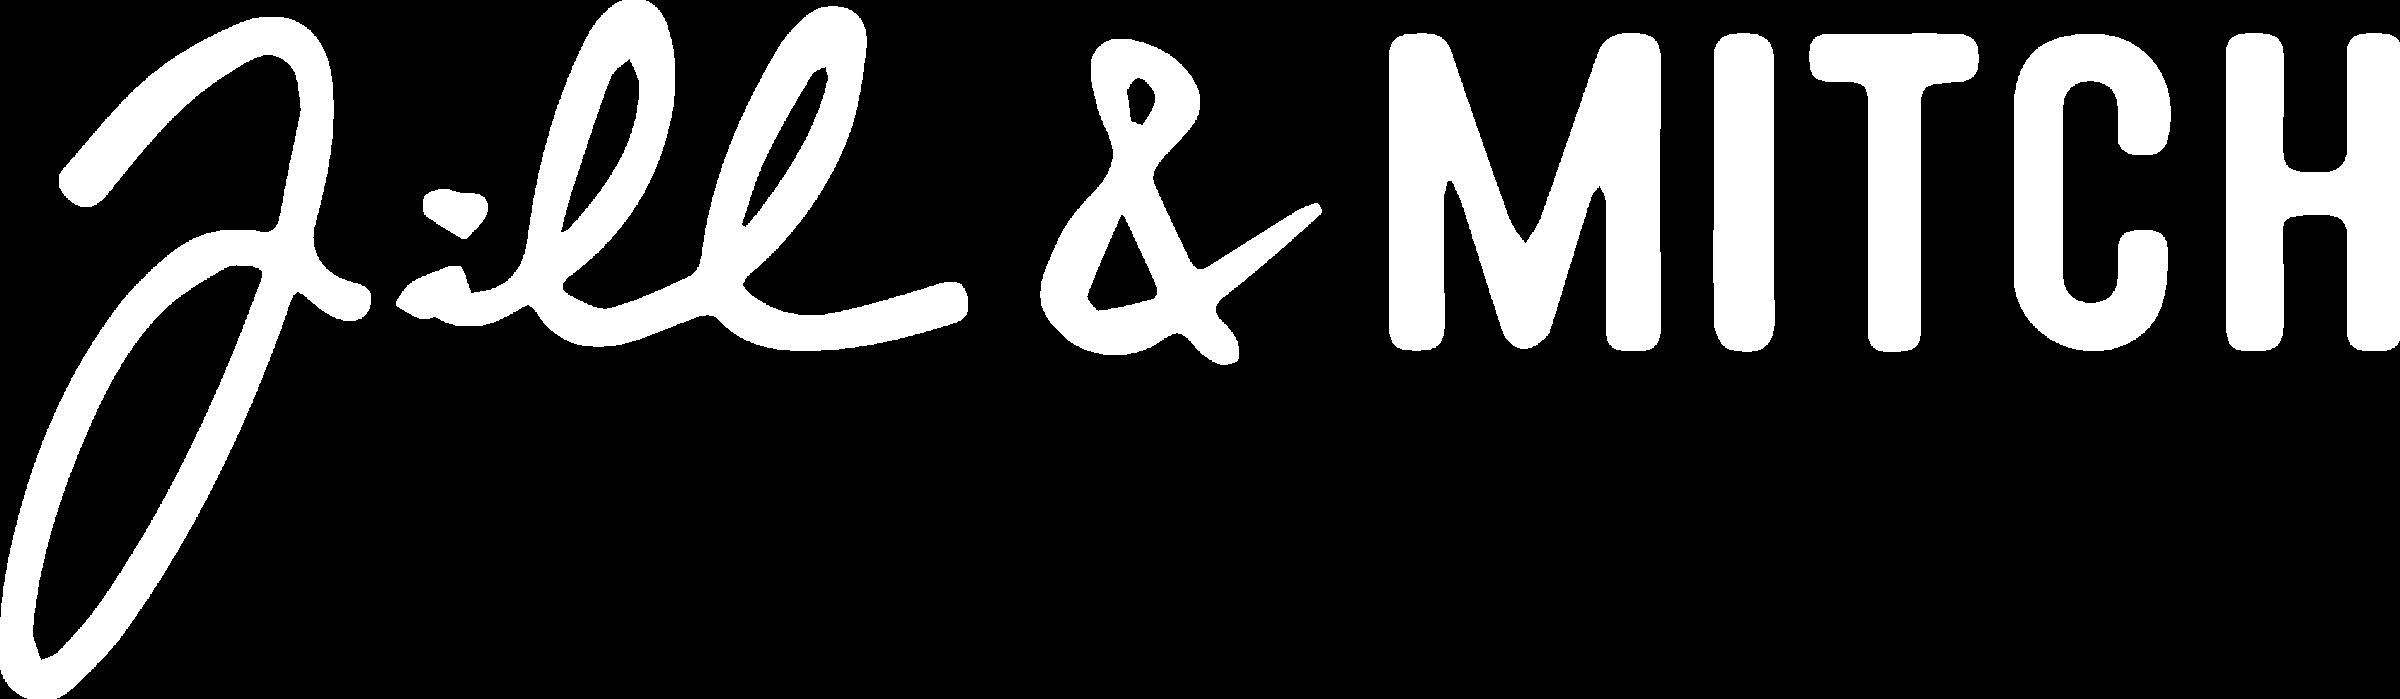 Jill & Mitch Logo